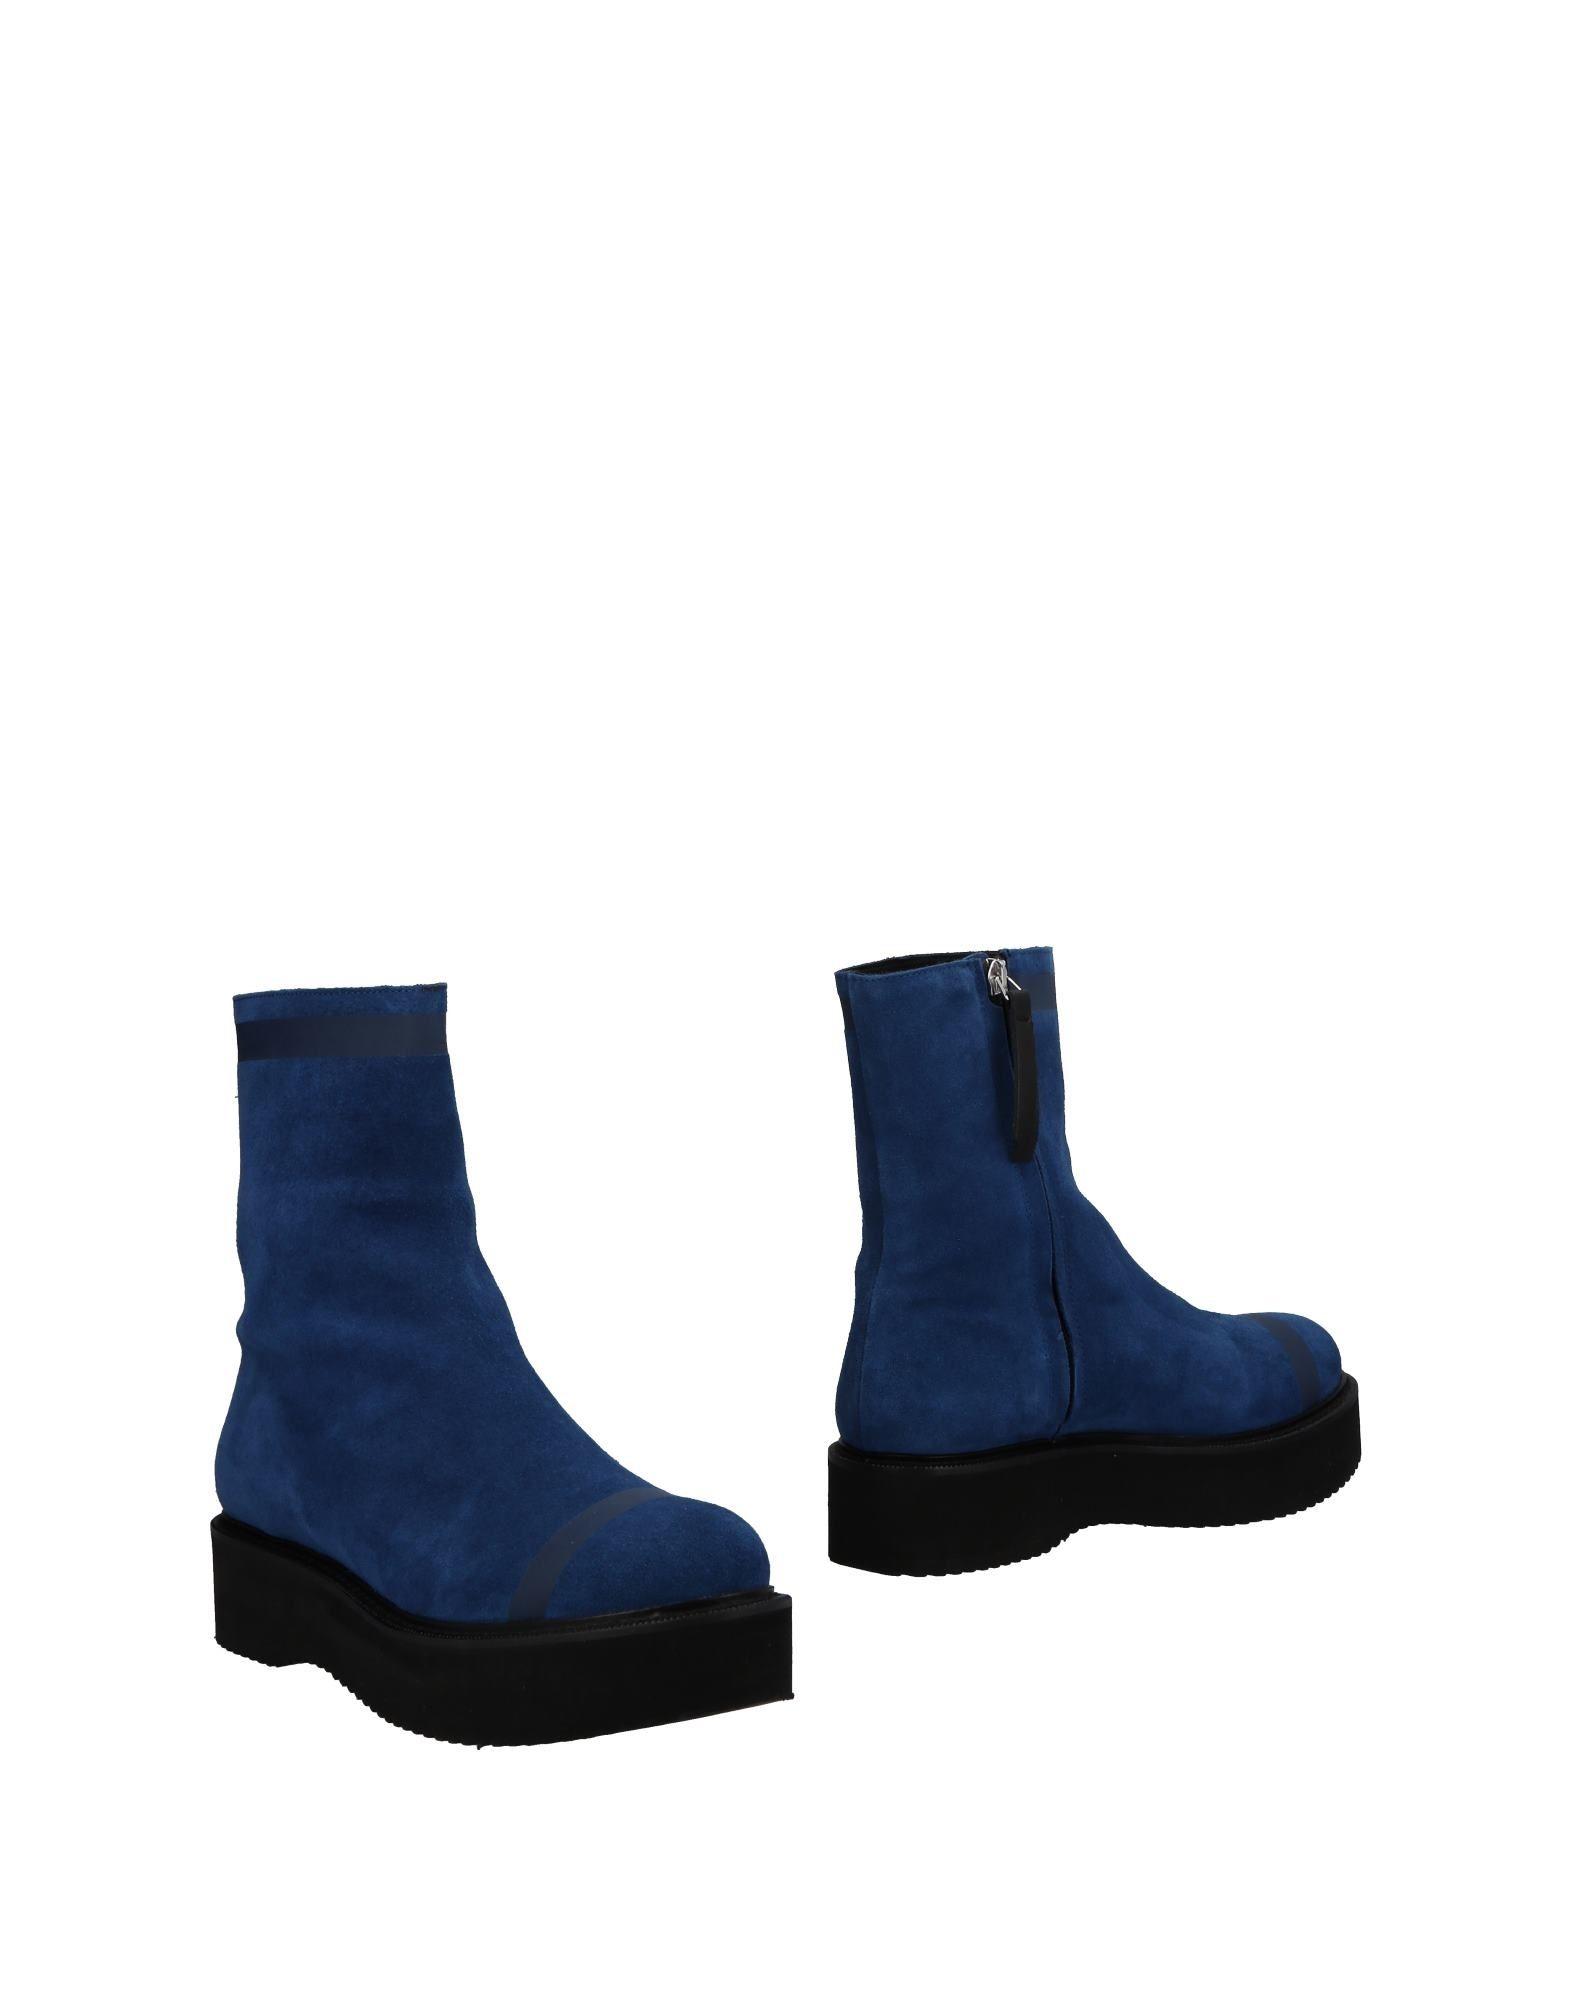 Stilvolle Valentini billige Schuhe Luca Valentini Stilvolle Stiefel Damen  11498213MF 5f5e68